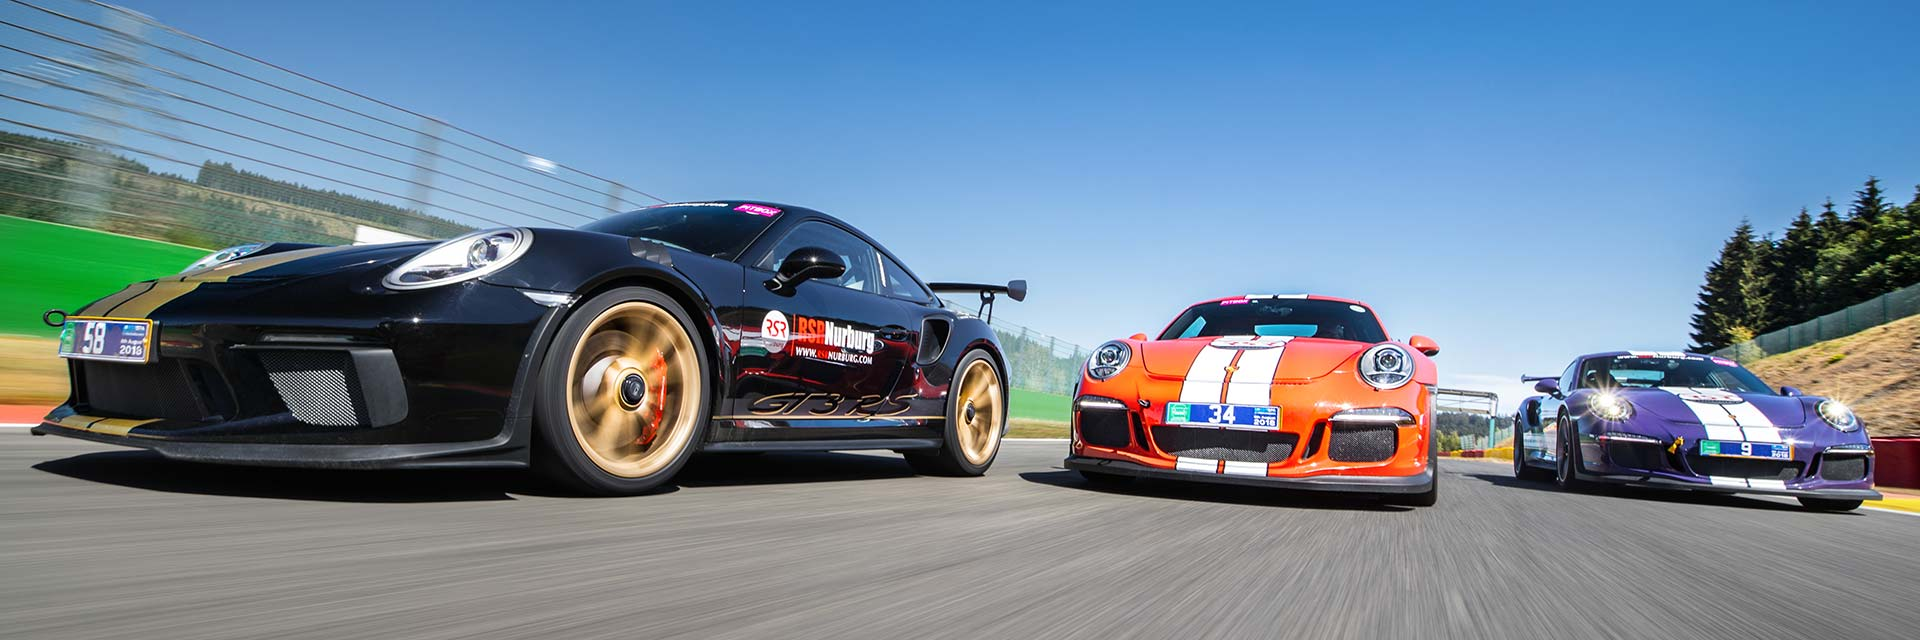 GEDLICH Racing - Racetracks Spa-Francorchamps